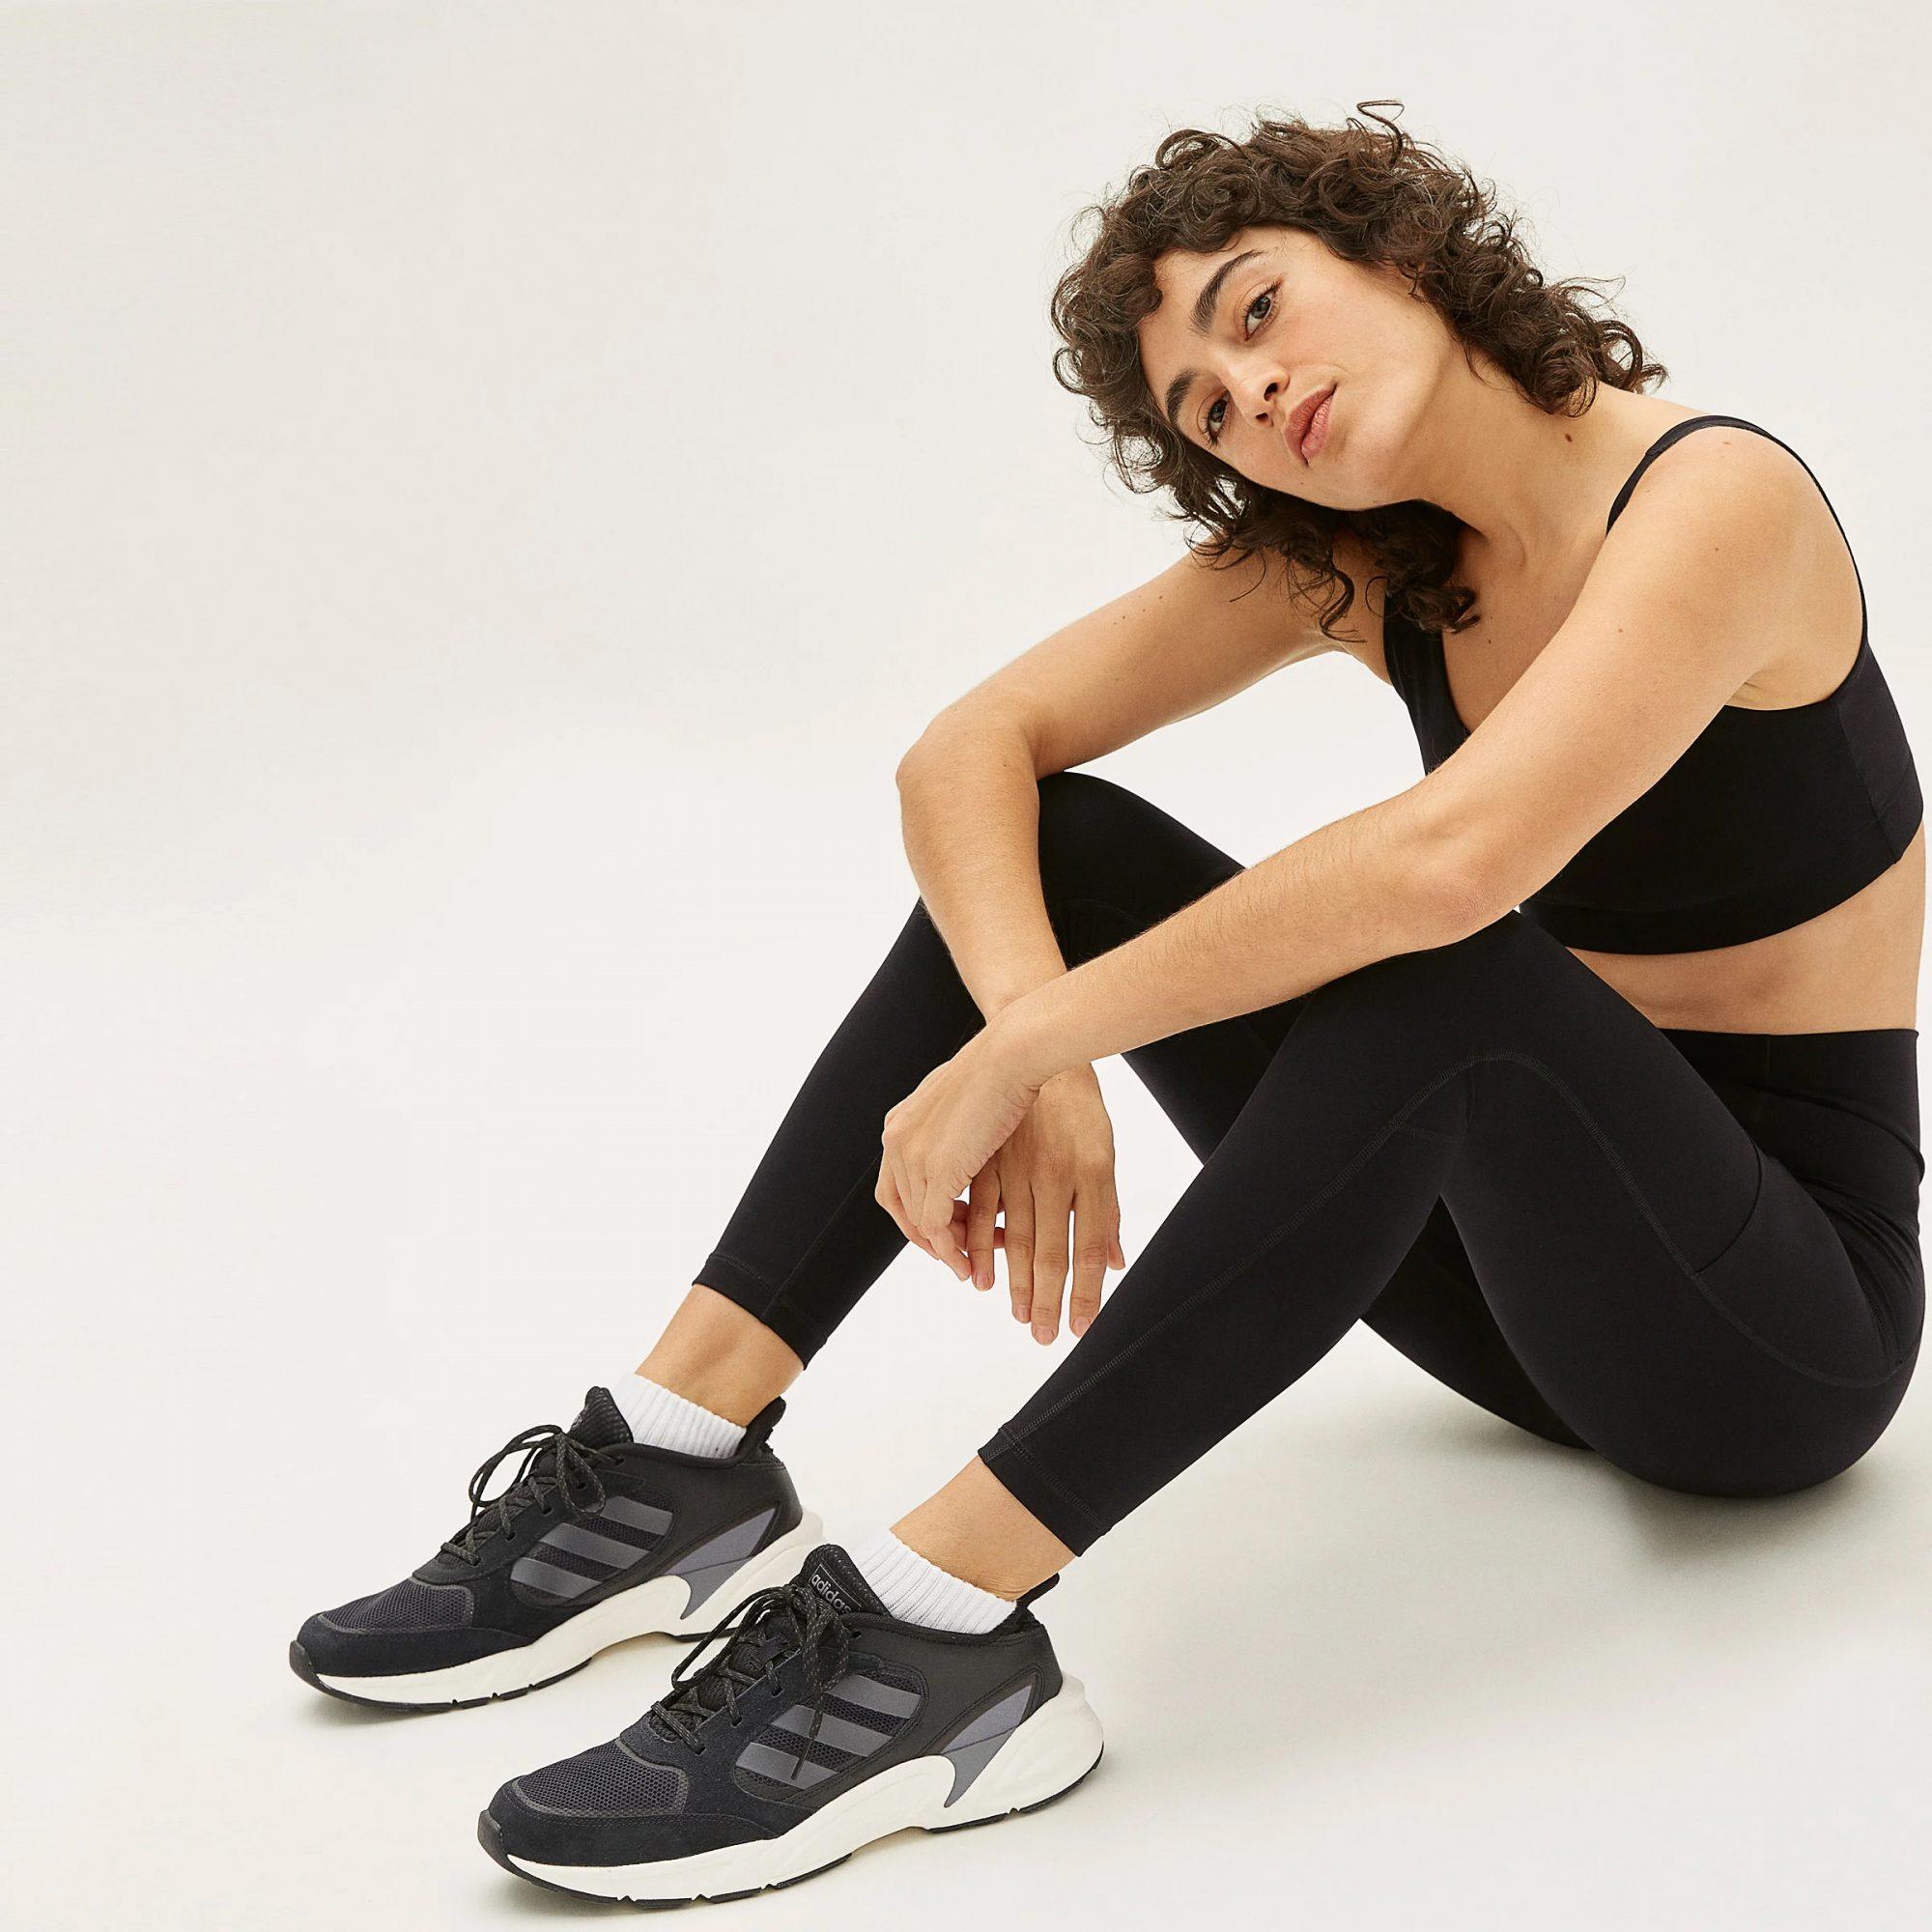 black perform leggings